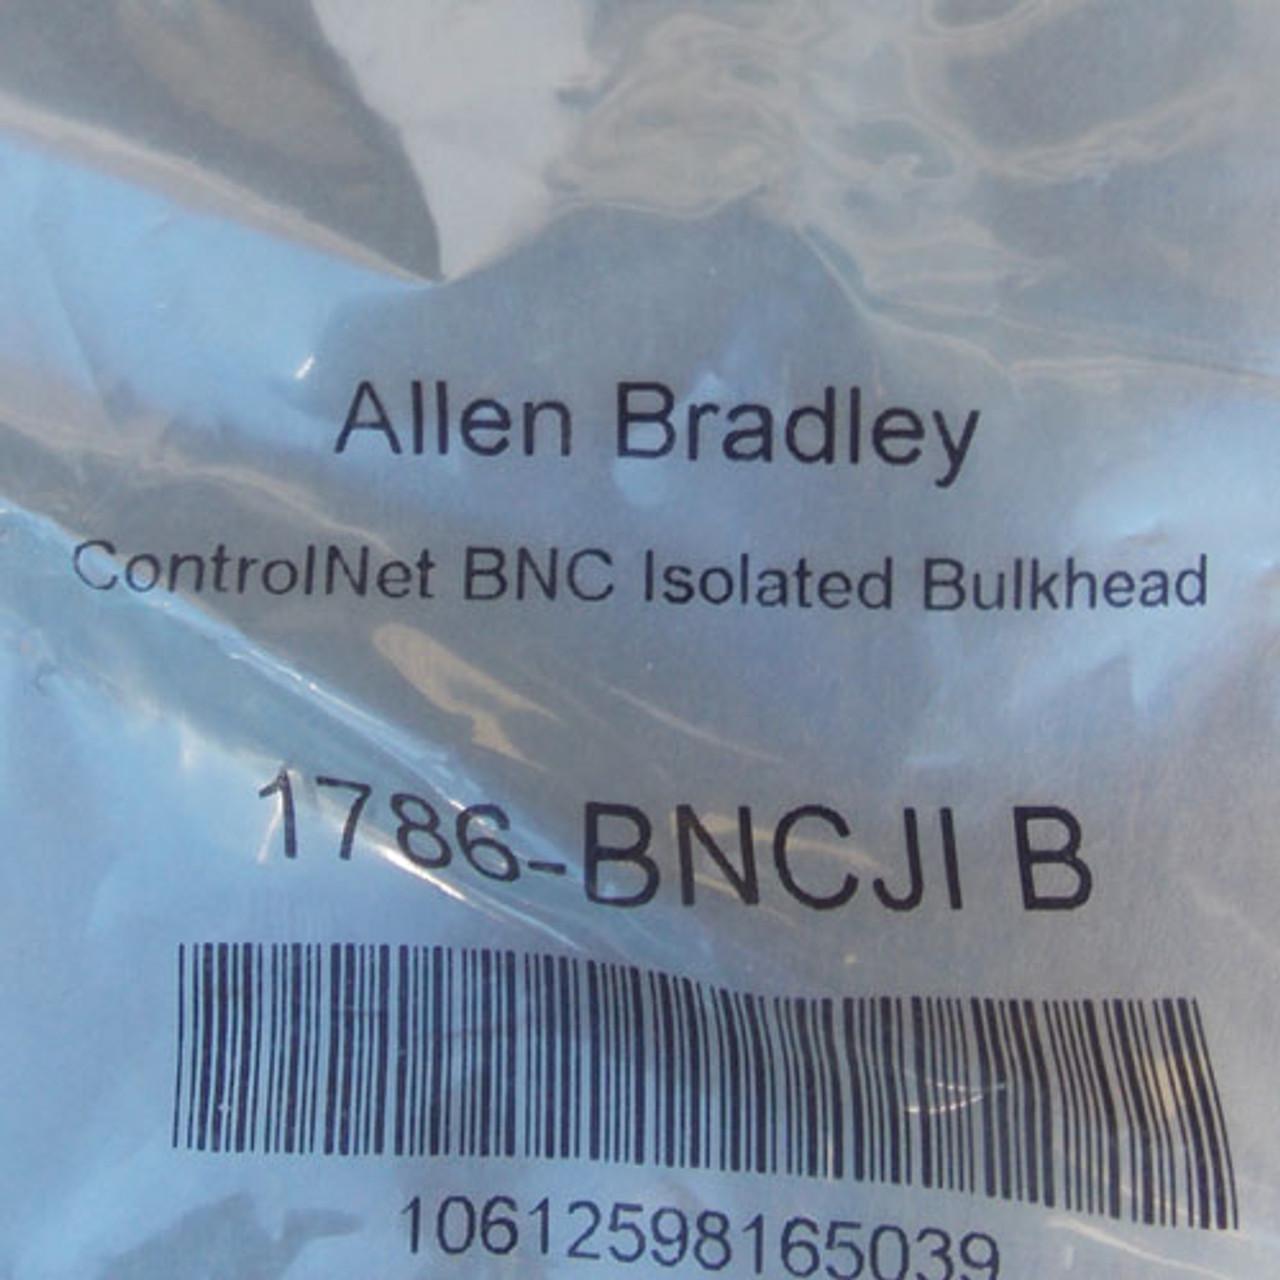 Allen-Bradley 1786-BNCJI B ControlNet BNC Isolated Bulkhead, Lot of 3 - New